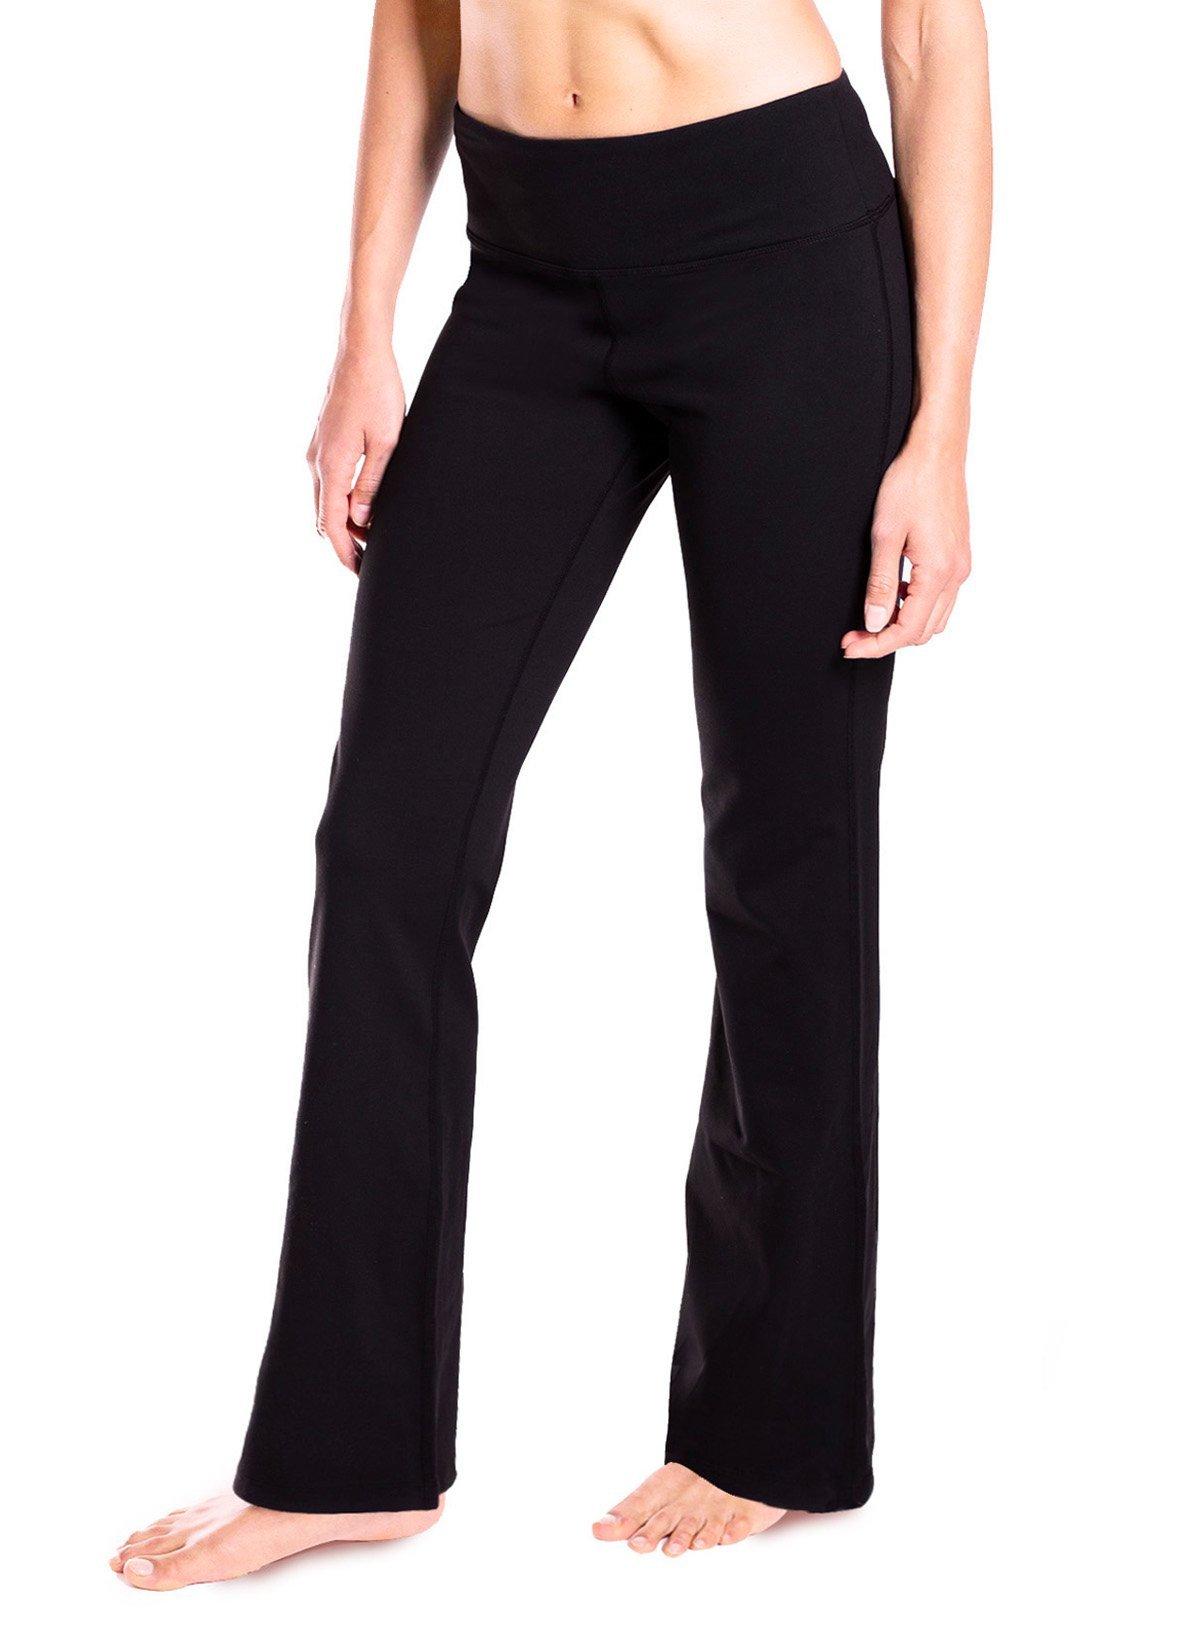 Yogipace 27''/28''/29''/30''/31''/32''/33''/35''/37'' Inseam,Petite/Regular/Tall, Women's Bootcut Yoga Pants Long Workout Pants, 28'', Black Size XXL by Yogipace (Image #2)